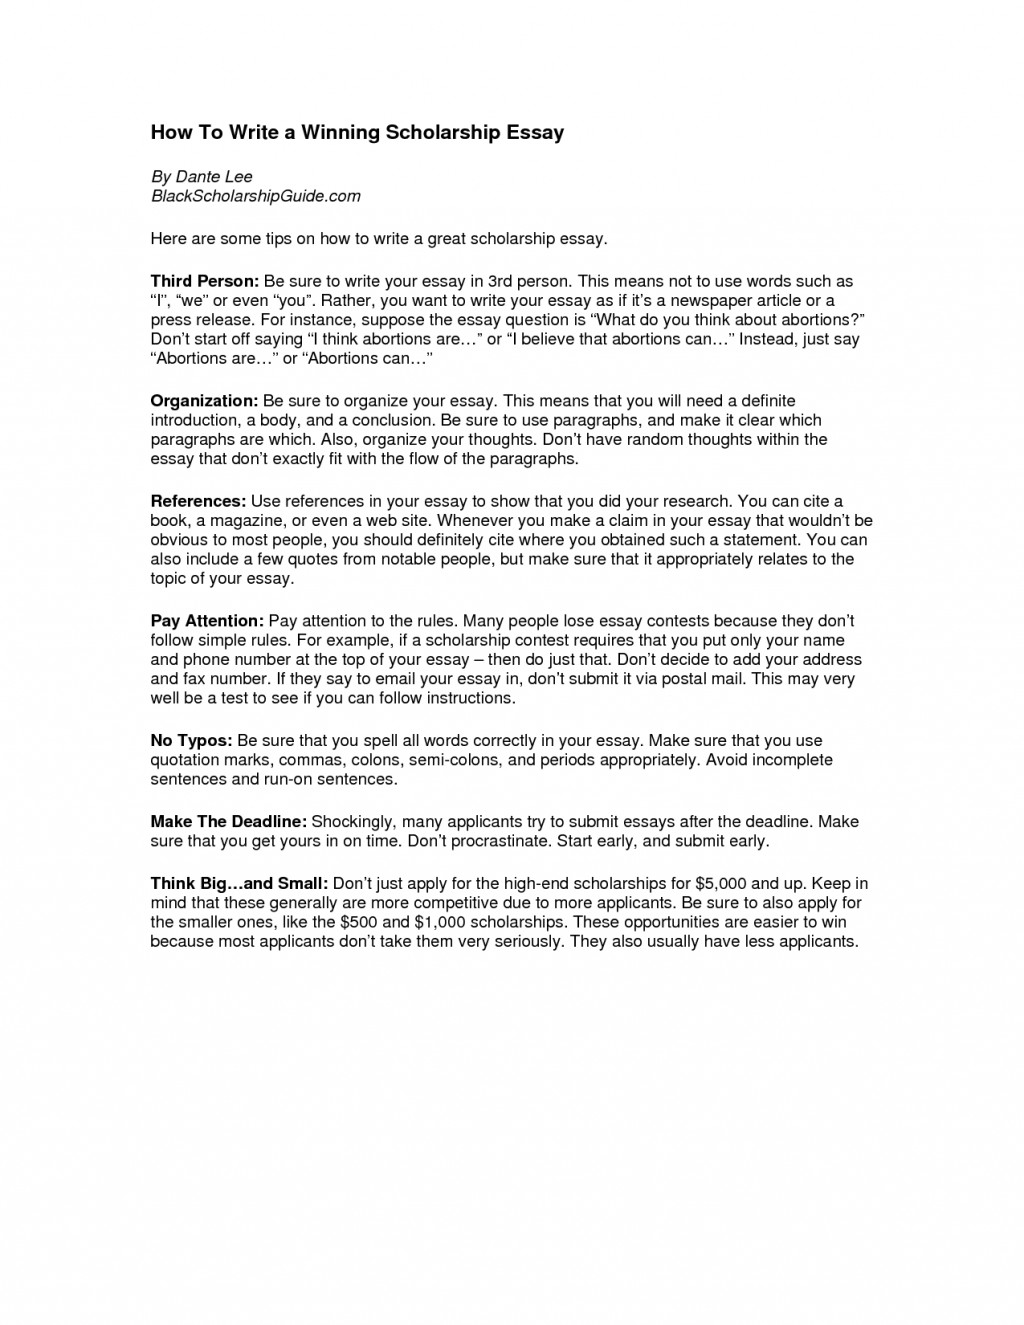 004 Zmemxteu5z Essay Example Sample Winning Scholarship Sensational Essays Large